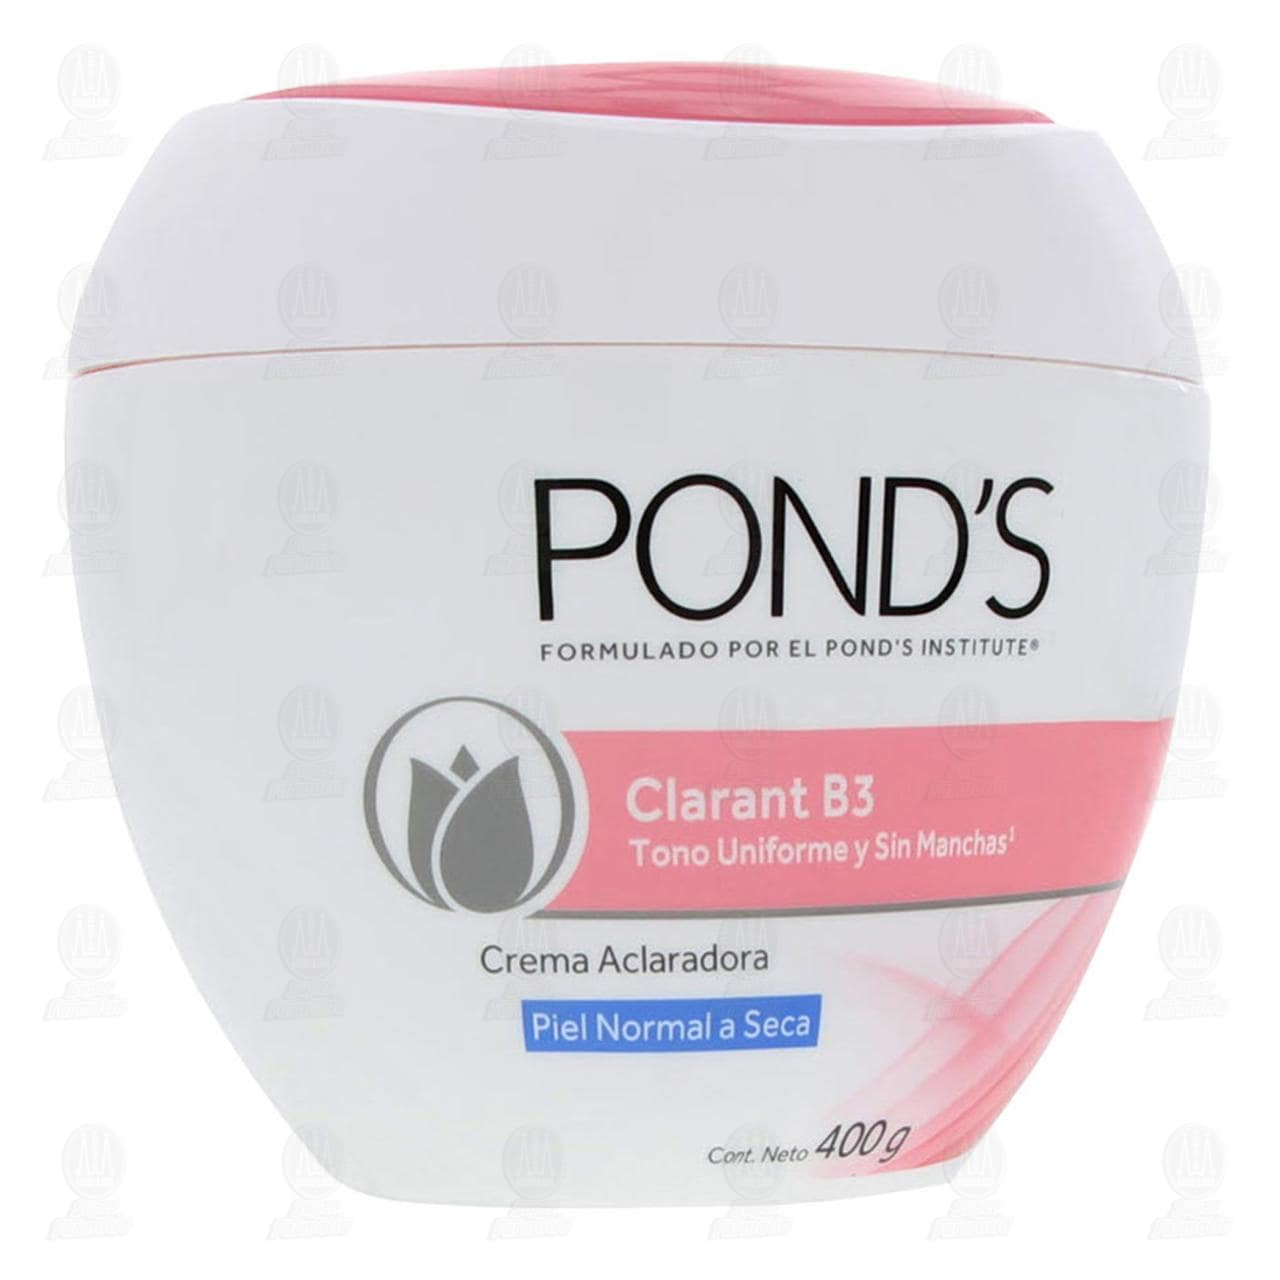 Comprar Crema Facial Pond's Clarant B3 para Piel Normal a Seca, 400 gr. en Farmacias Guadalajara